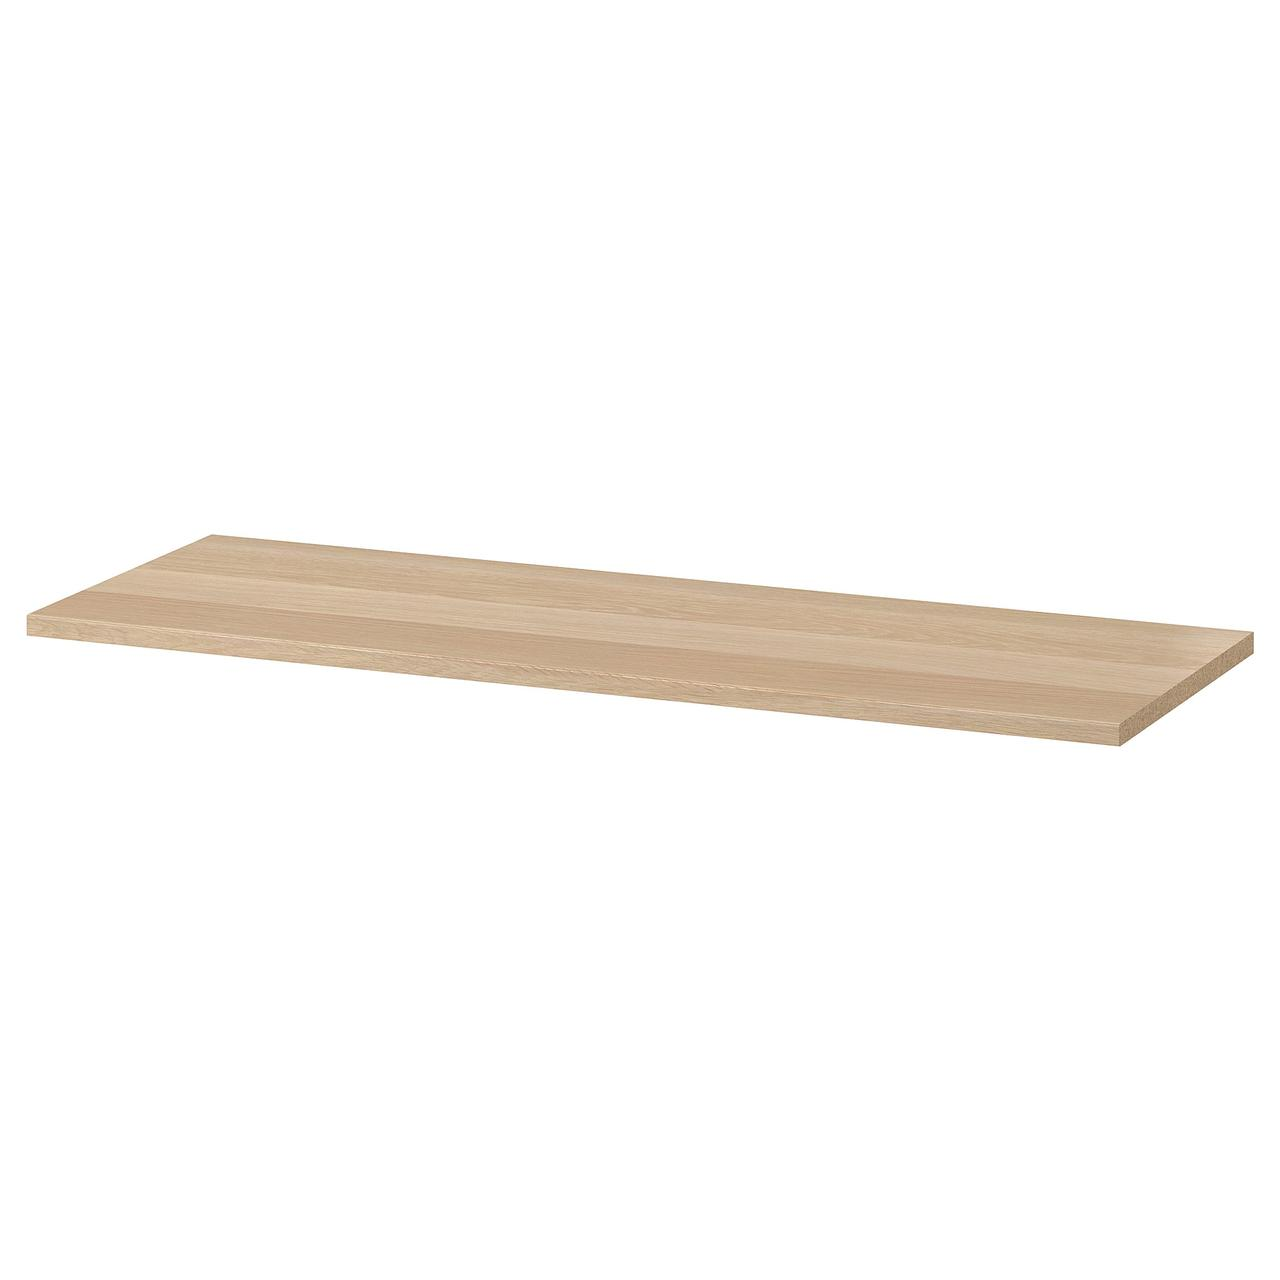 IKEA Полку KOMPLEMENT (ІКЕА КОМПЛІМЕНТ) 10273504